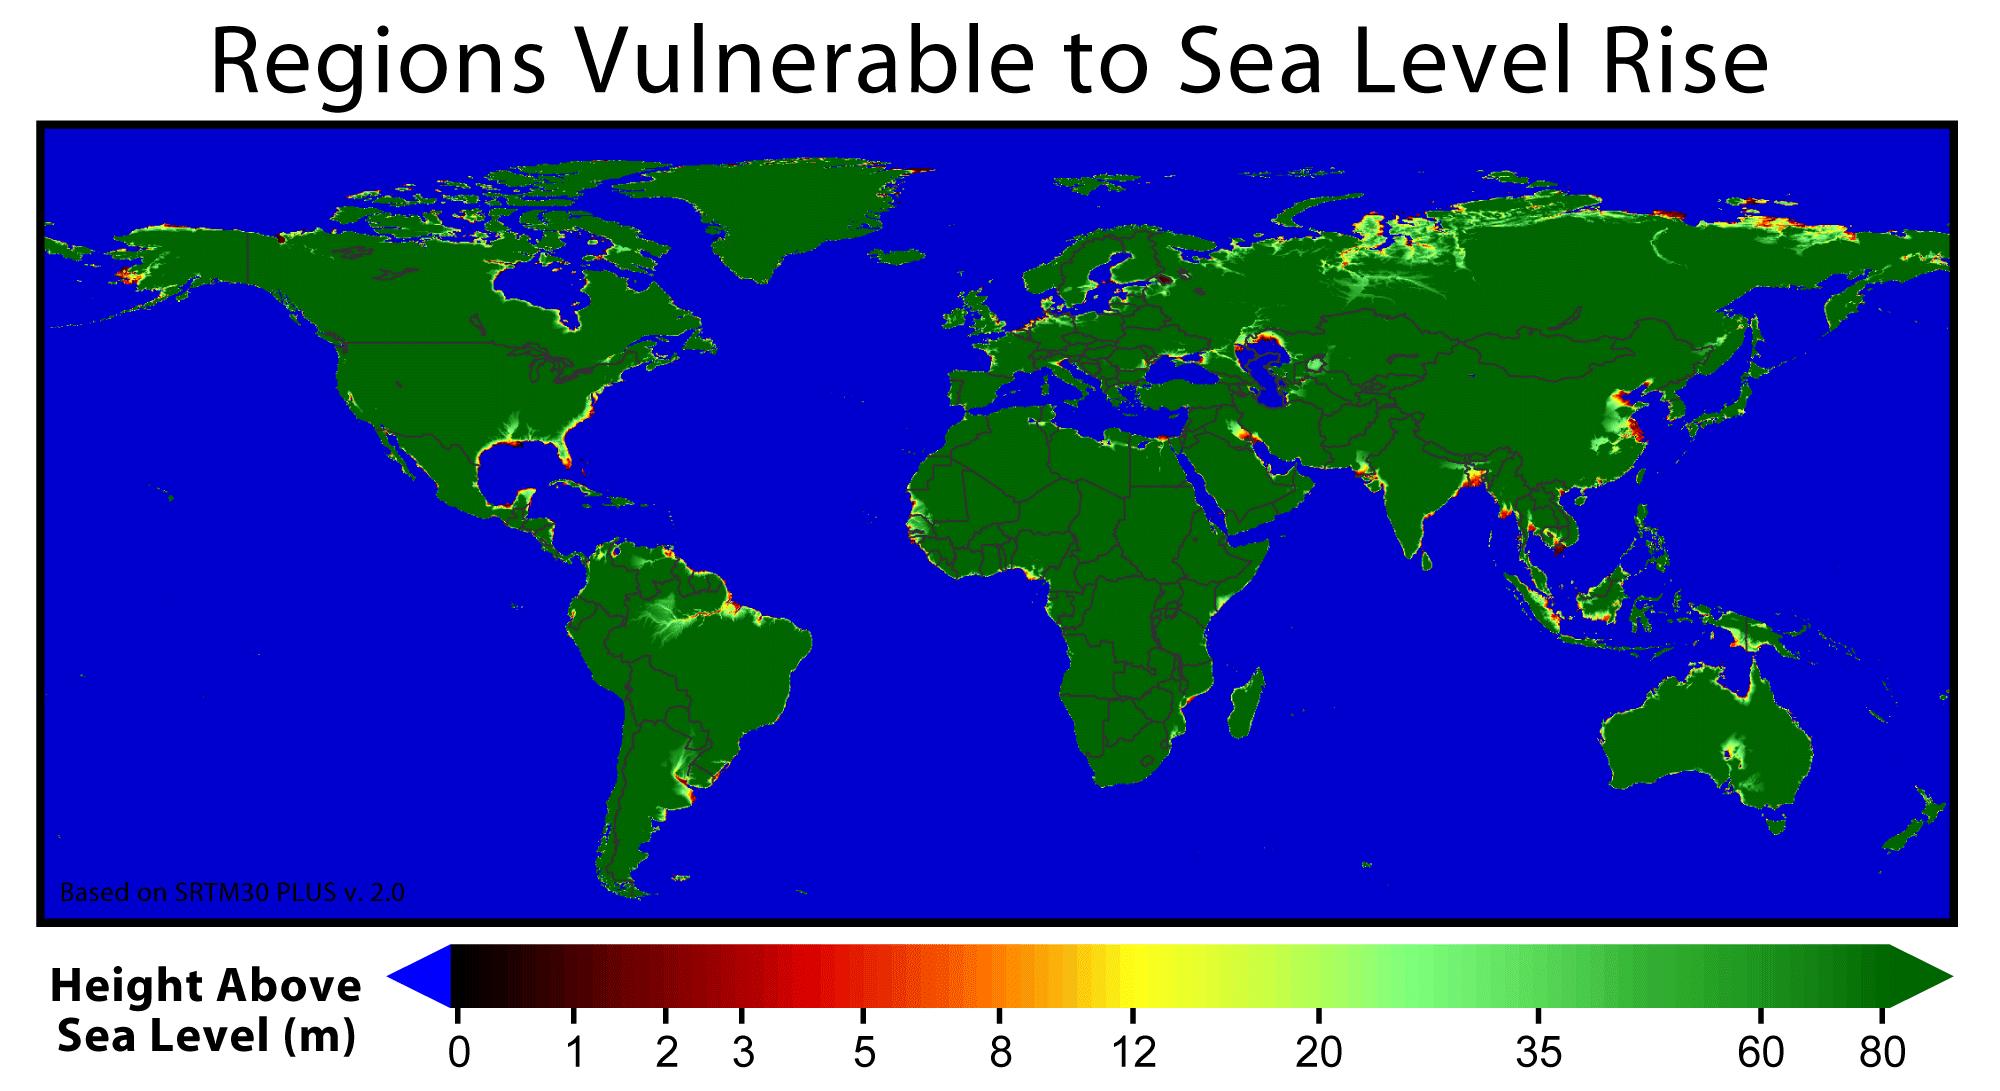 globalsealevelriseriskspng (×)  travelling without moving pinterest  sea level rise sea level and antarctica. globalsealevelriseriskspng (×)  travelling without